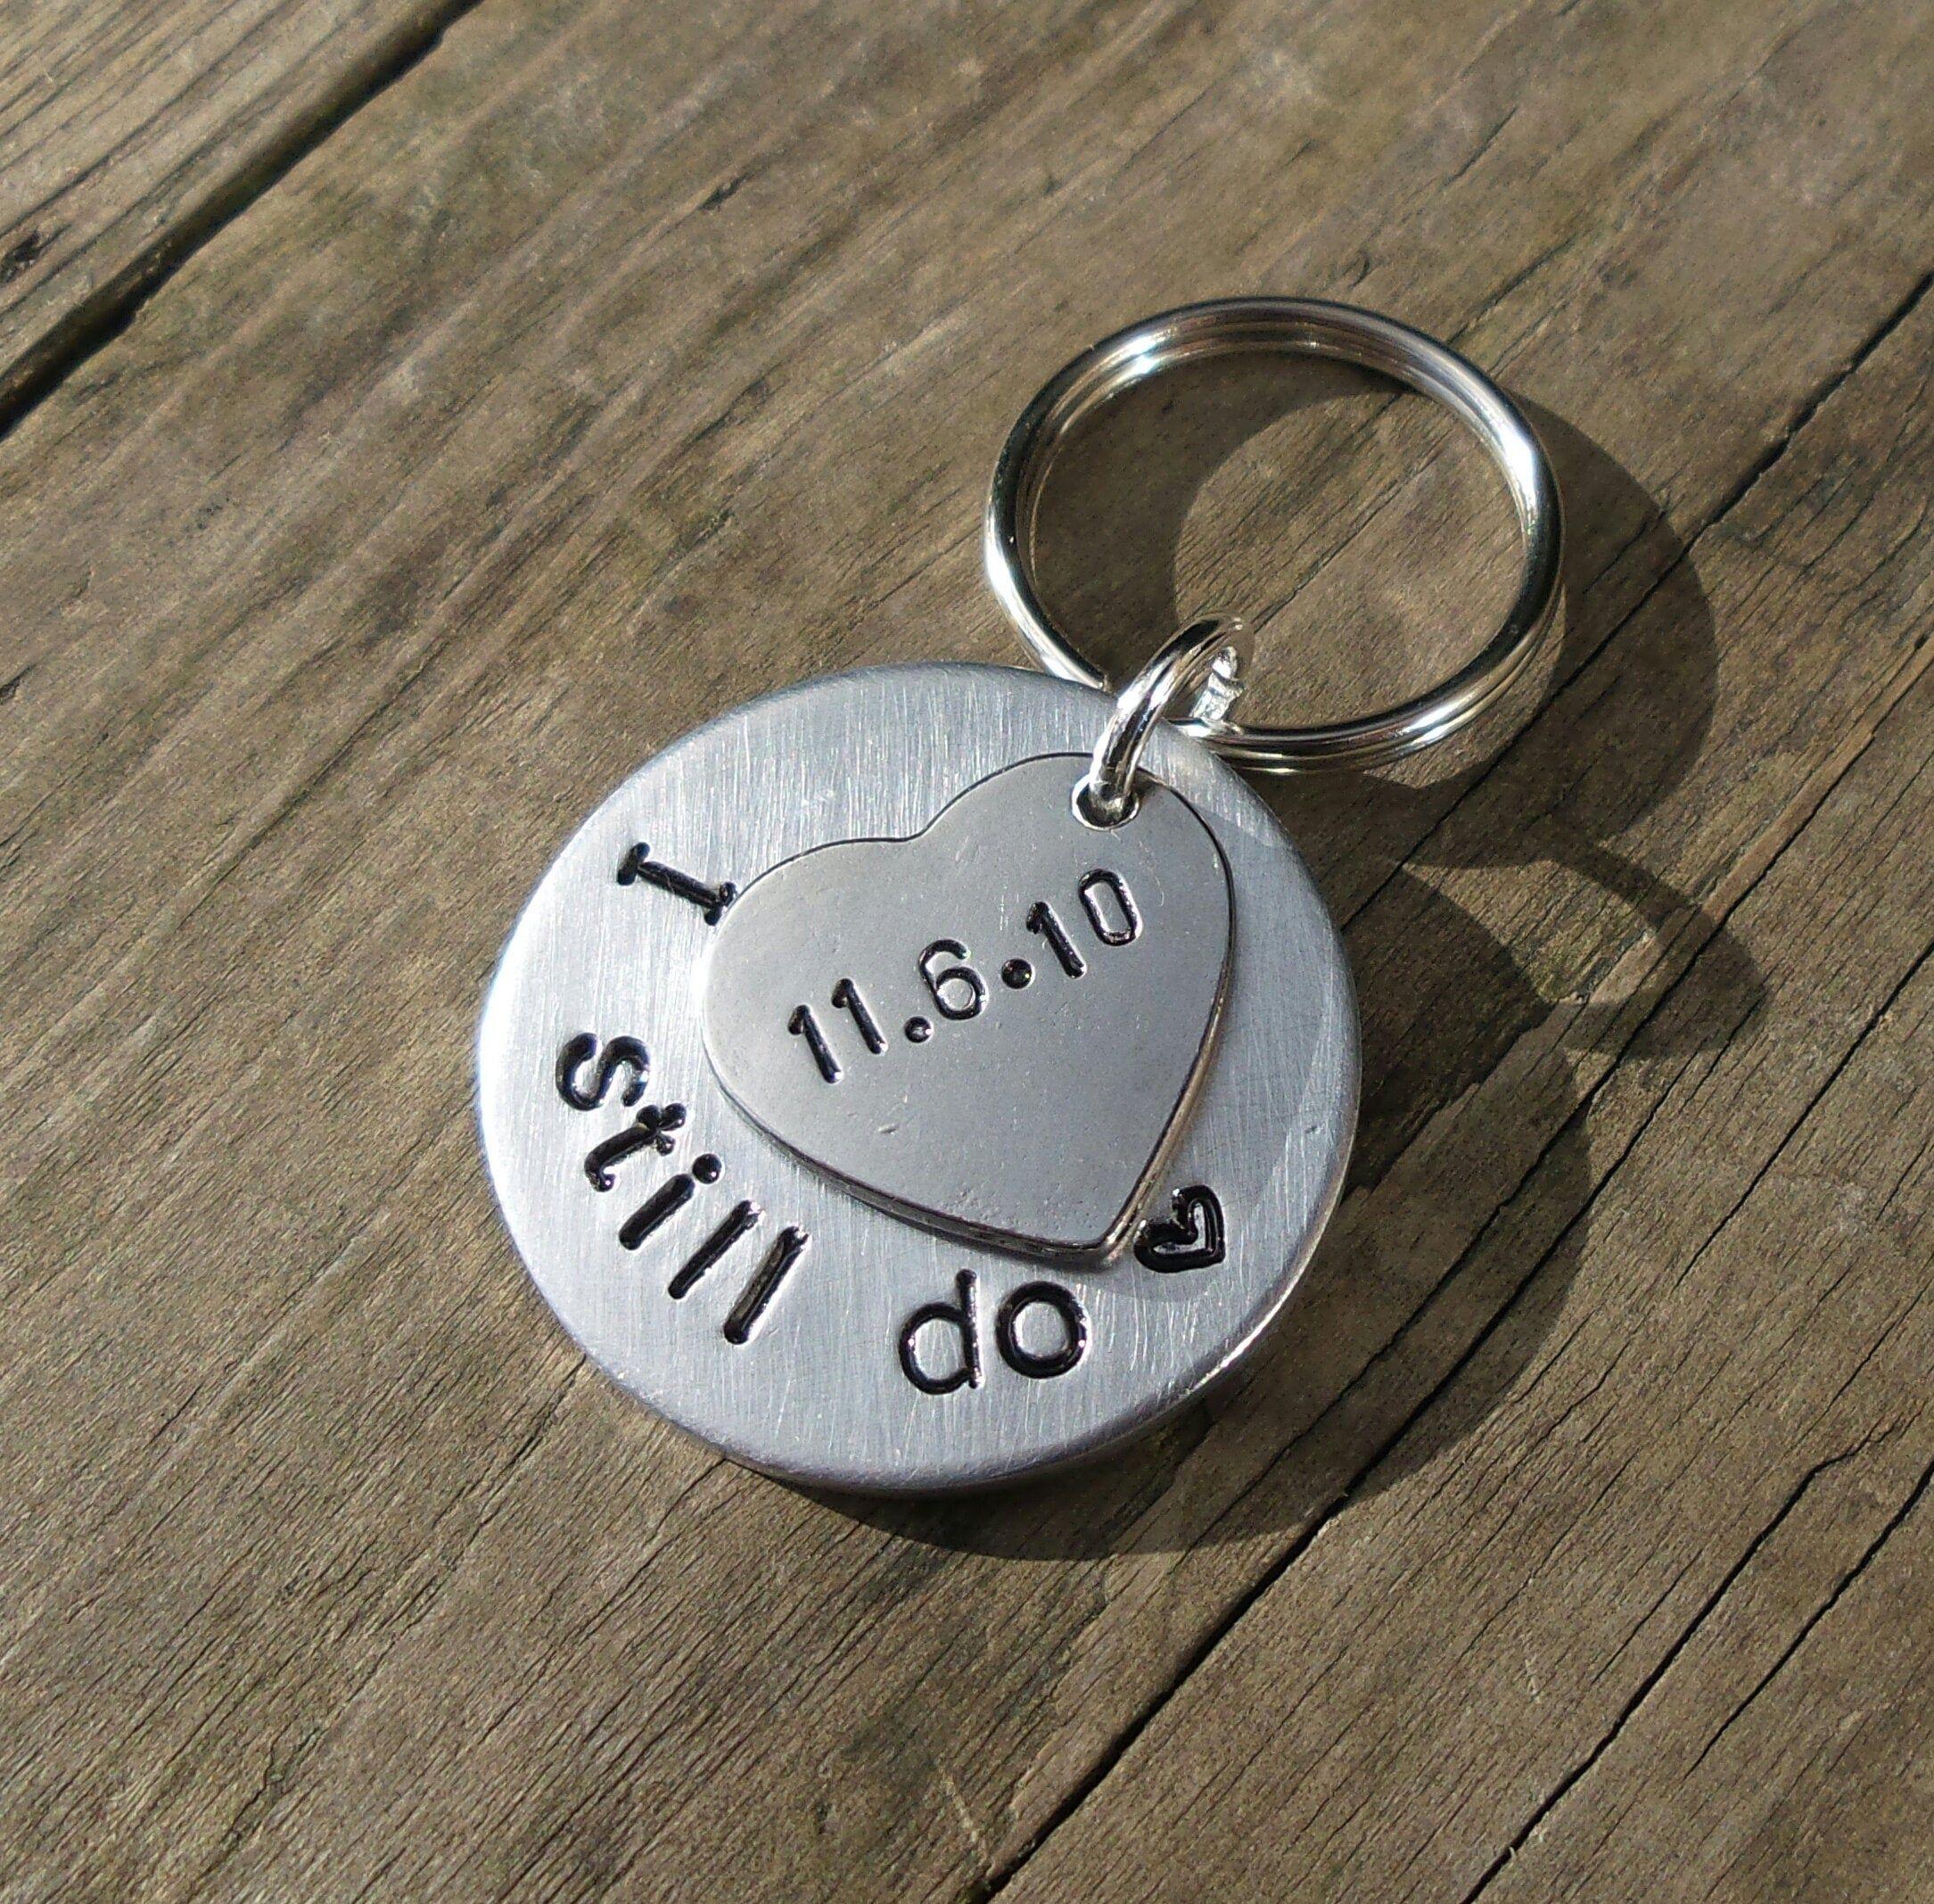 I STILL DO Keyring Husband Wife Gifts For Men Women 10th